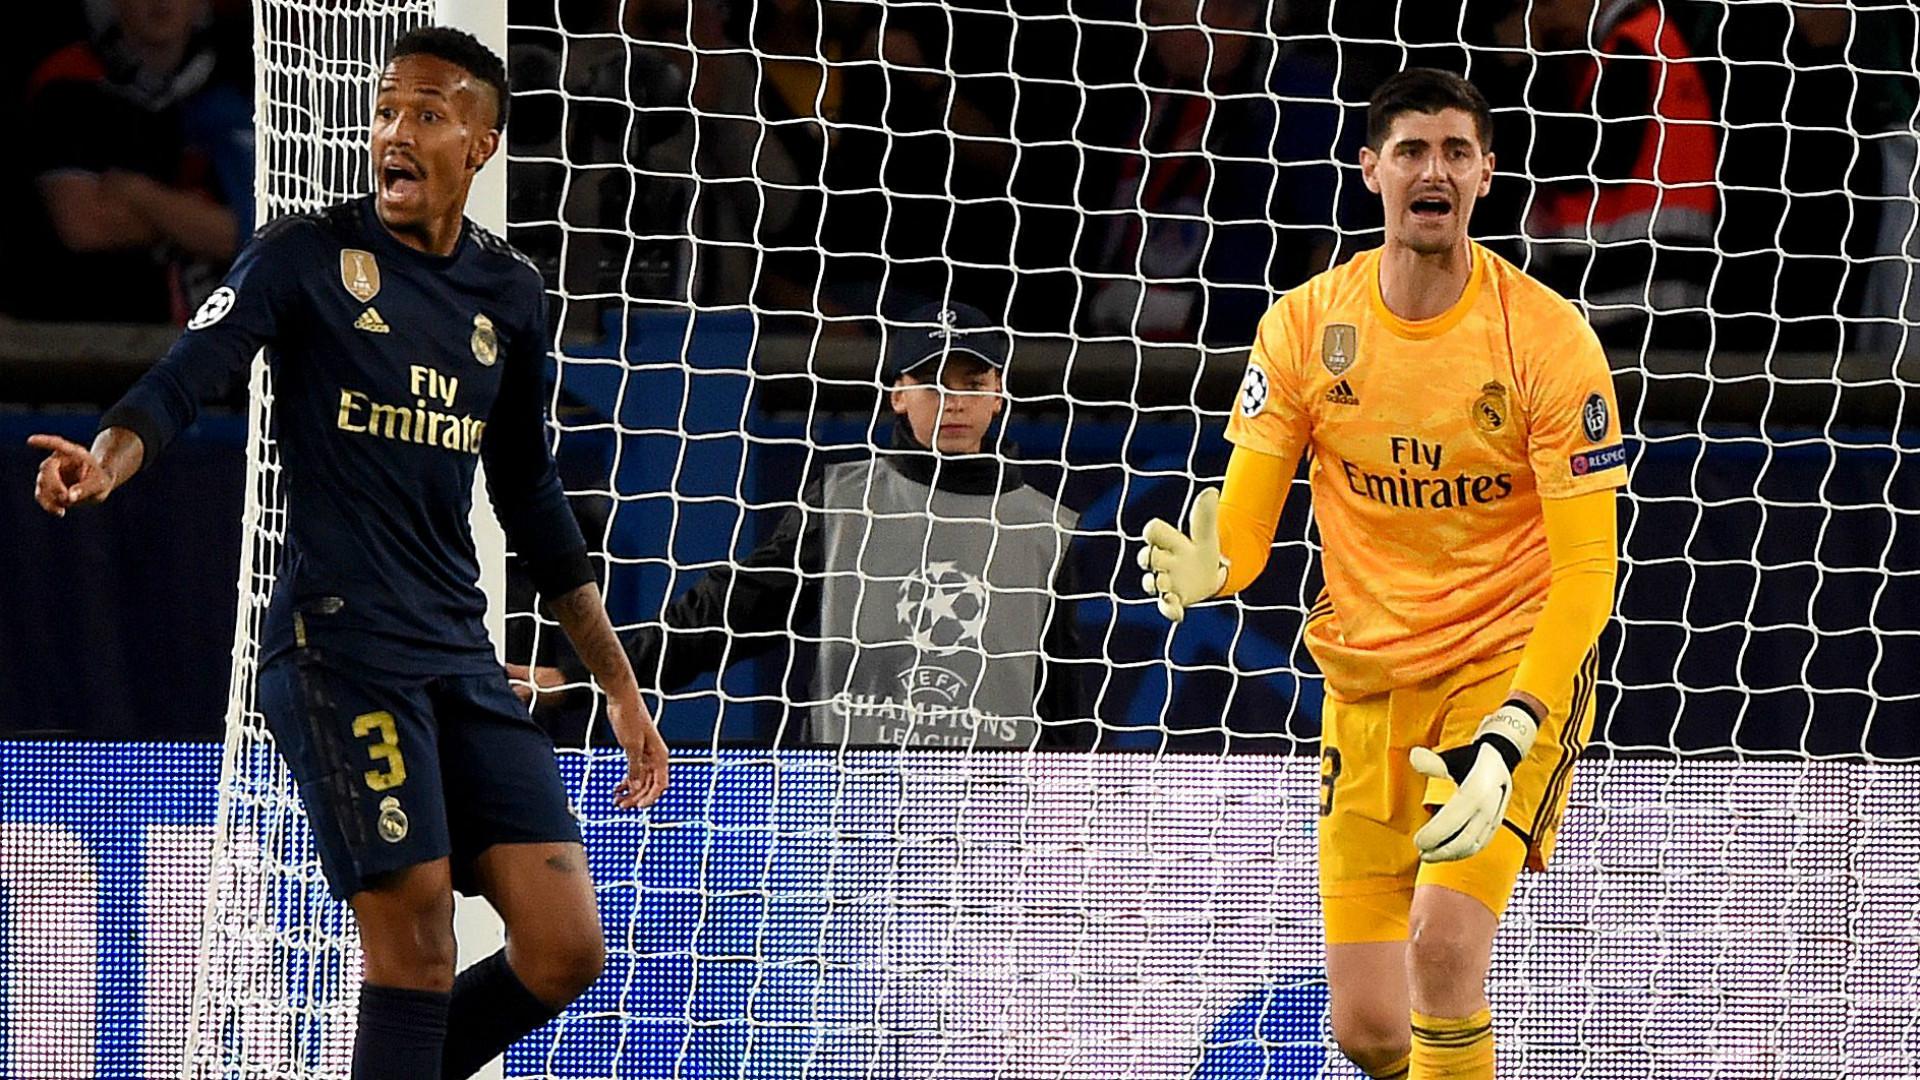 Eder Militao Thibaut Courtois Real Madrid 2019-20